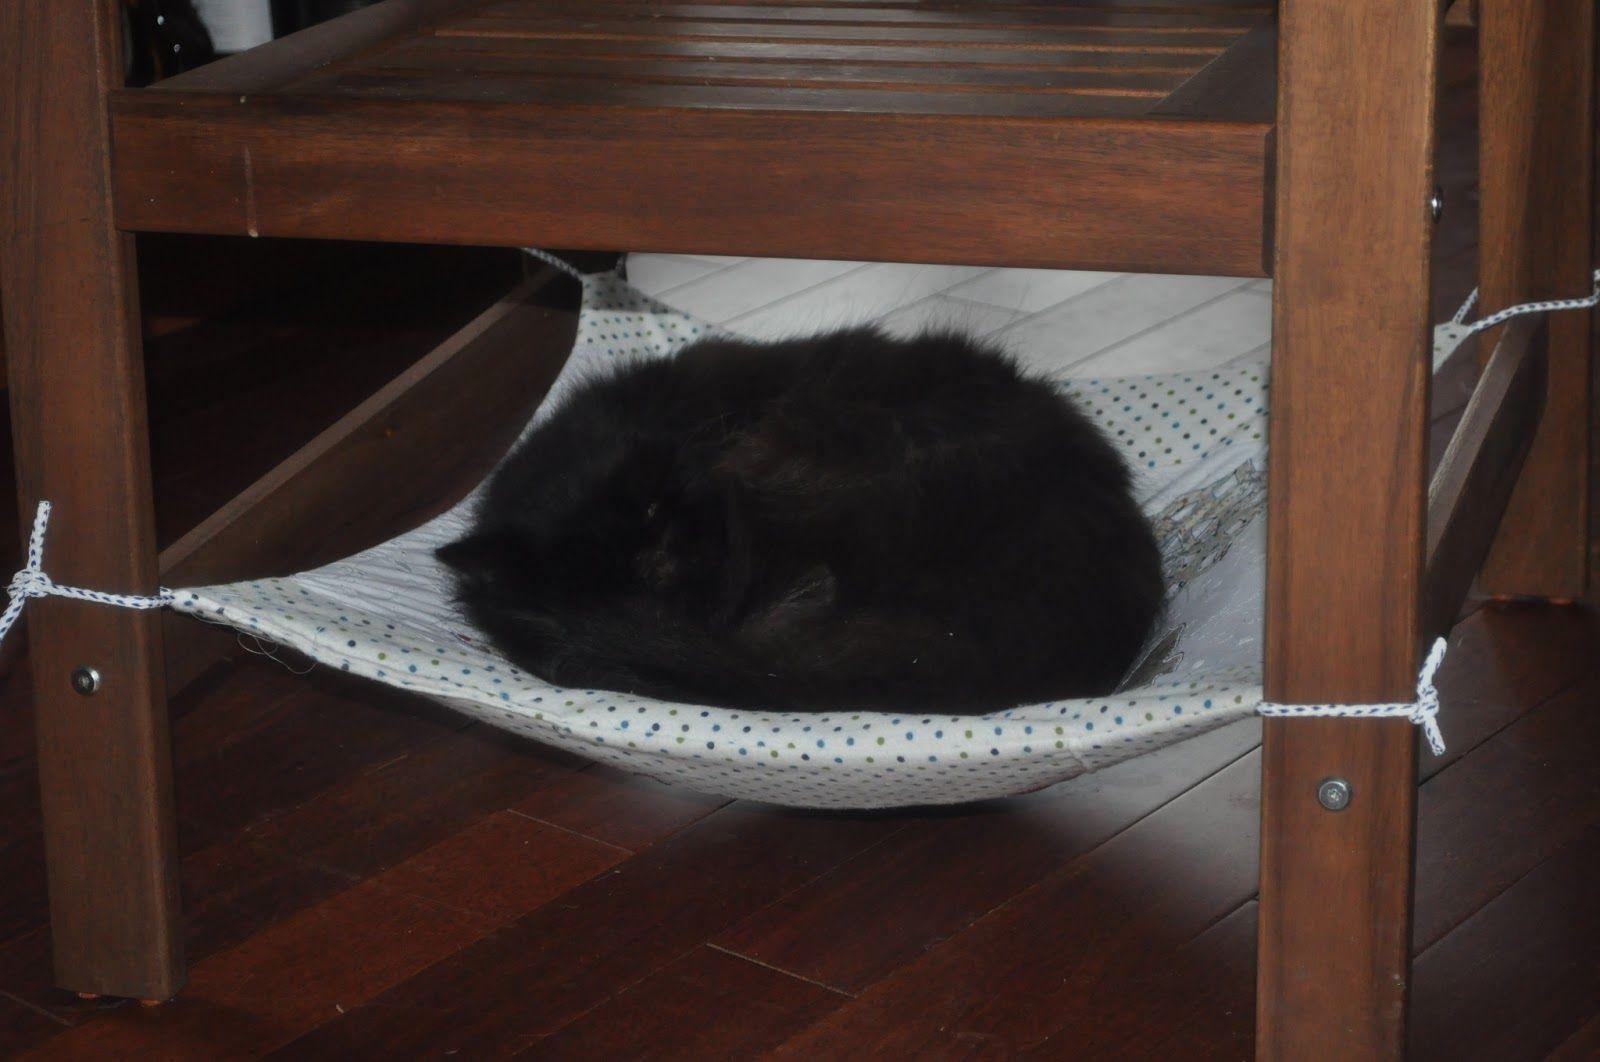 Un Hamac De Chaise Pour Mes Chats Avec Appliques Inverses Hammock In A Chair For My Cats With Reversed Appliqued Hamac Diy Hamac Chat Lit Pour Chat